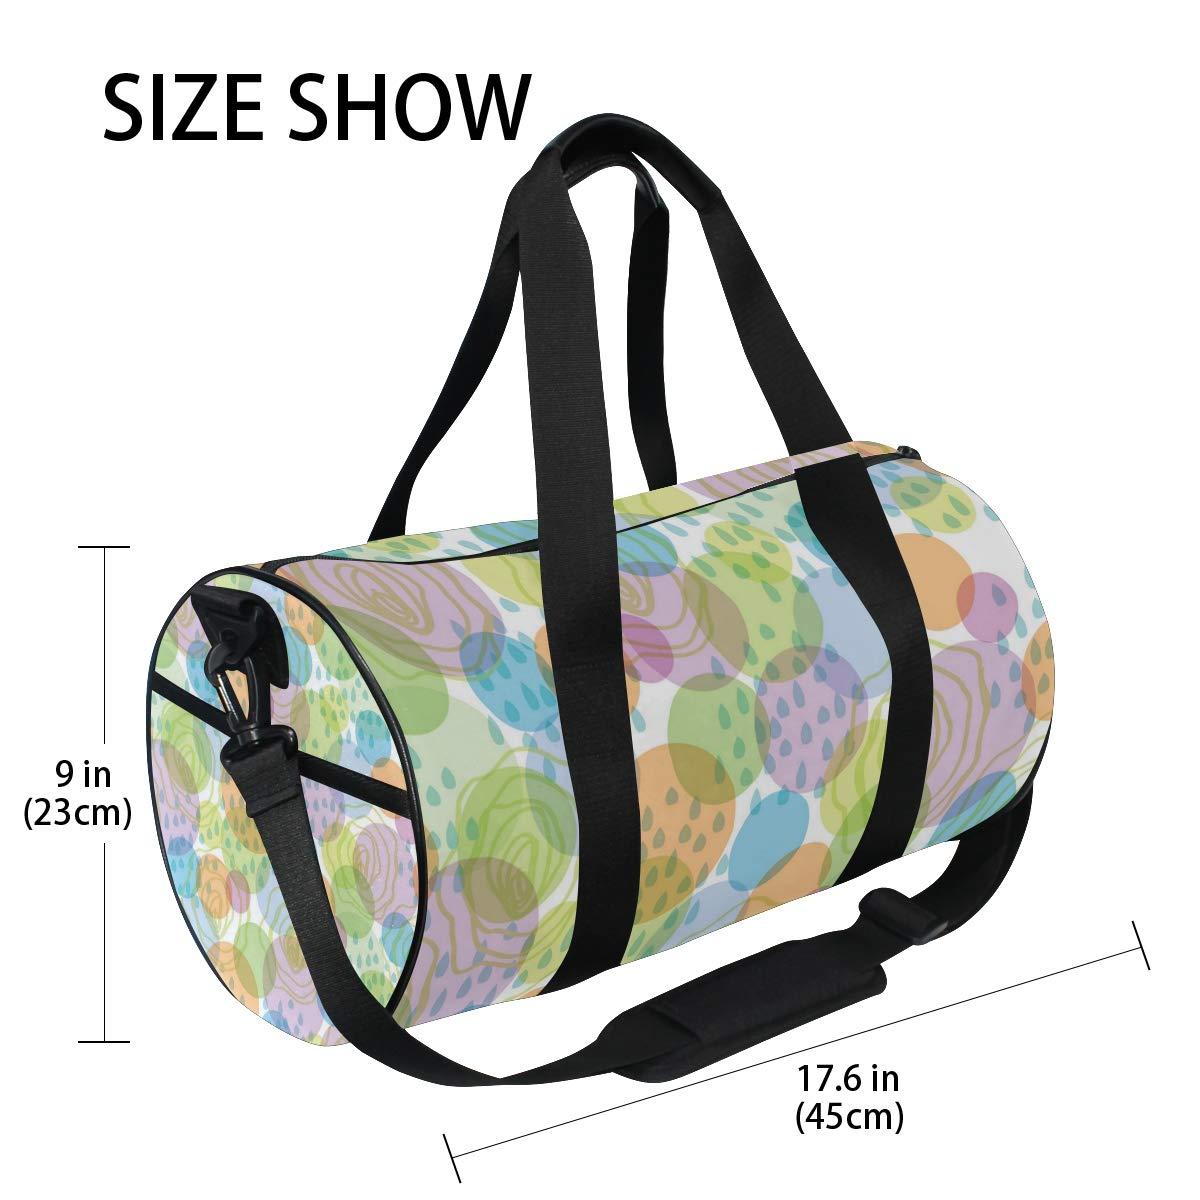 Fascinating Colorful RaindropsWaterproof Non-Slip Wearable Crossbody Bag fitness bag Shoulder Bag